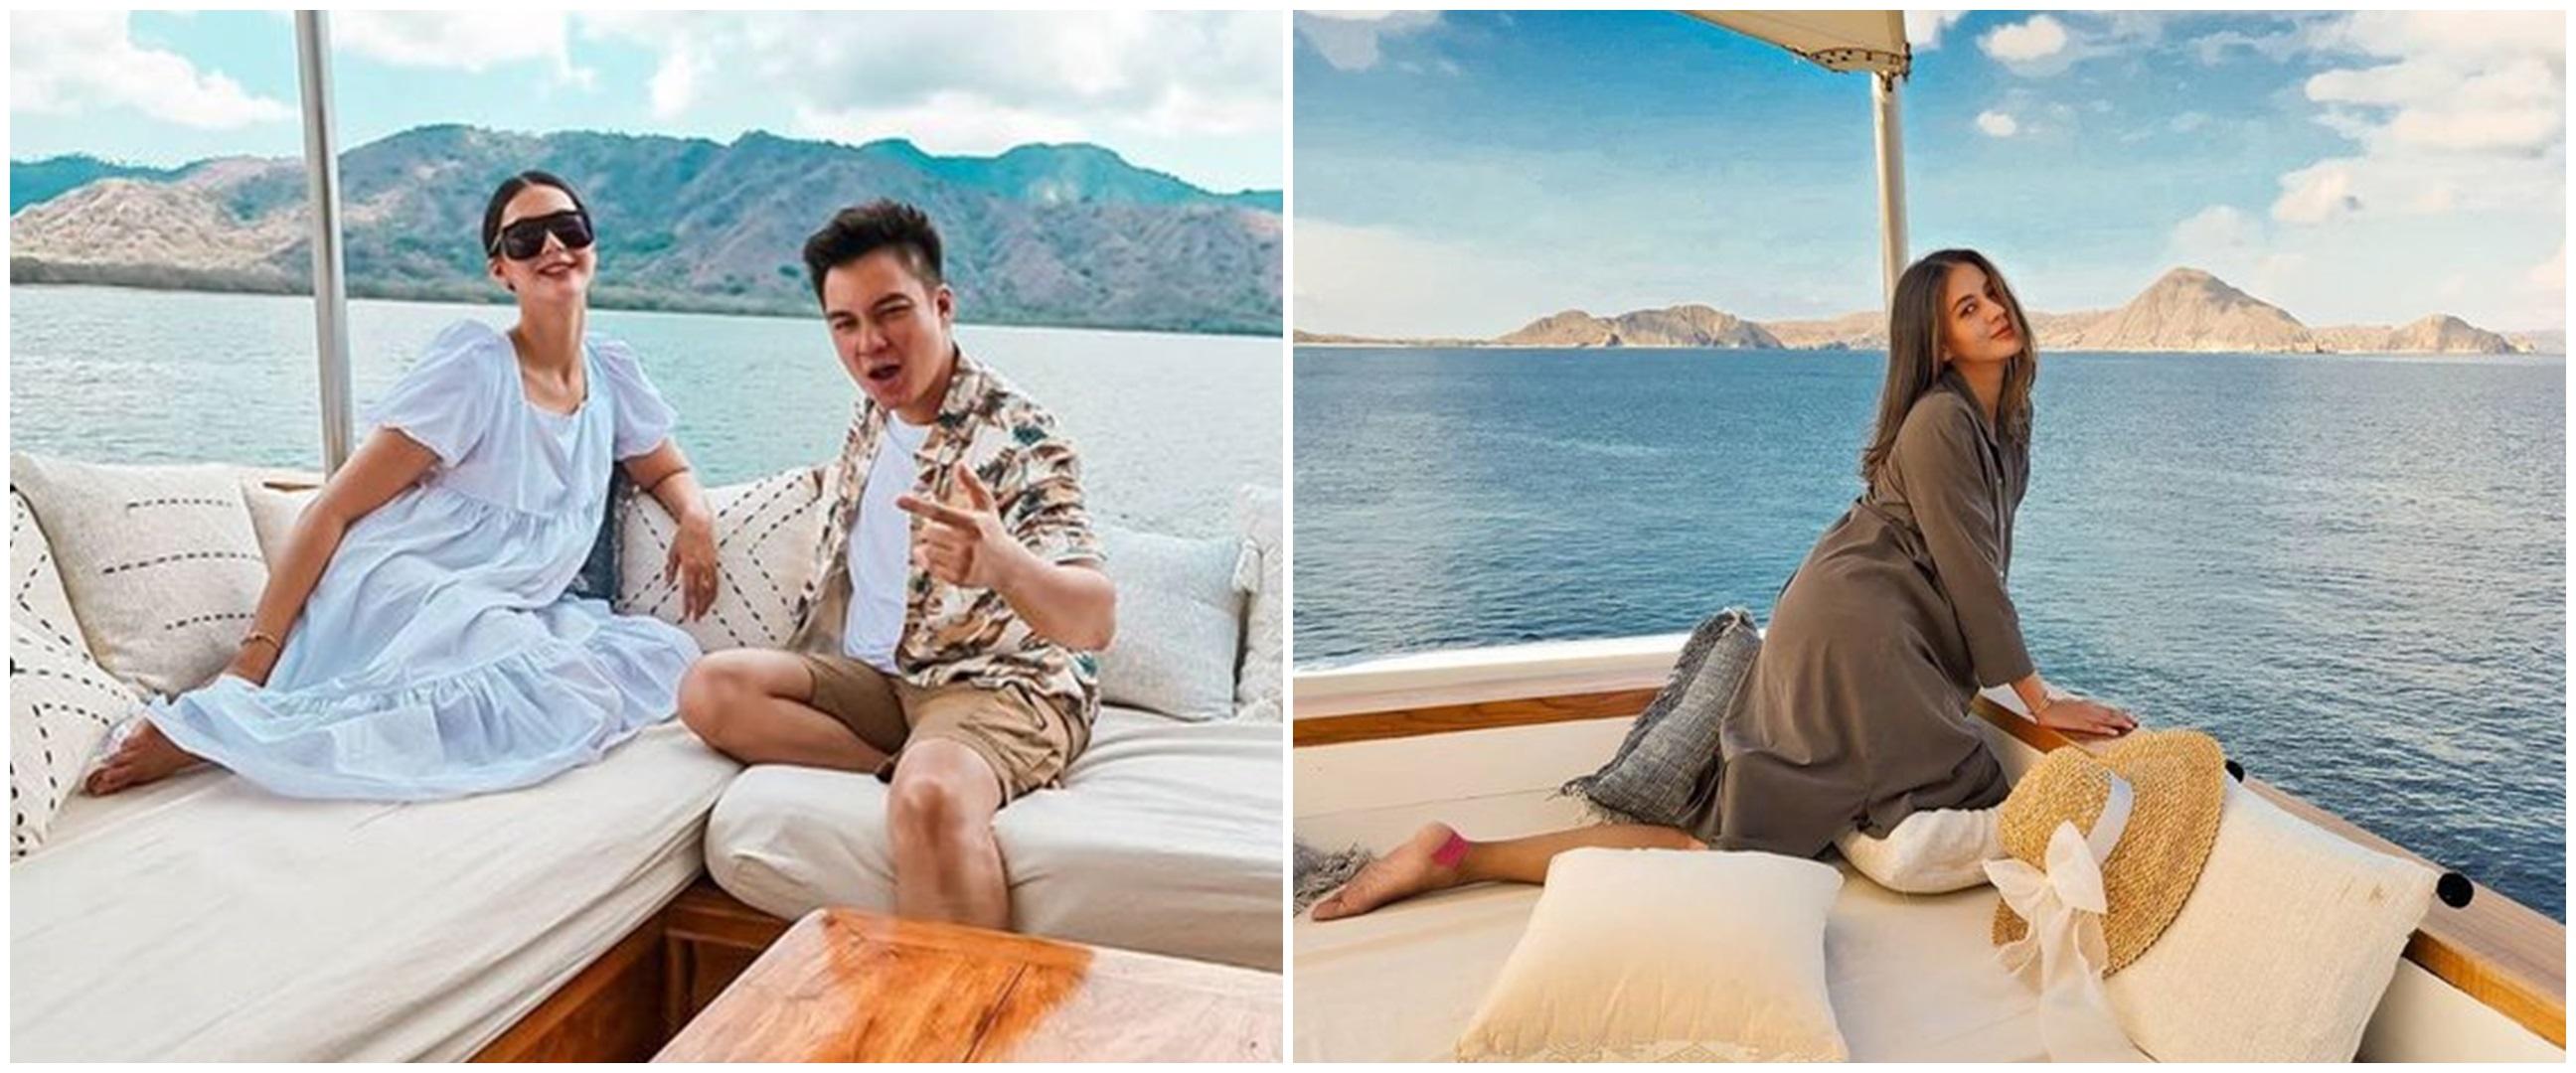 10 Potret Baim Wong dan Paula liburan ke Labuan Bajo, bak ABG pacaran